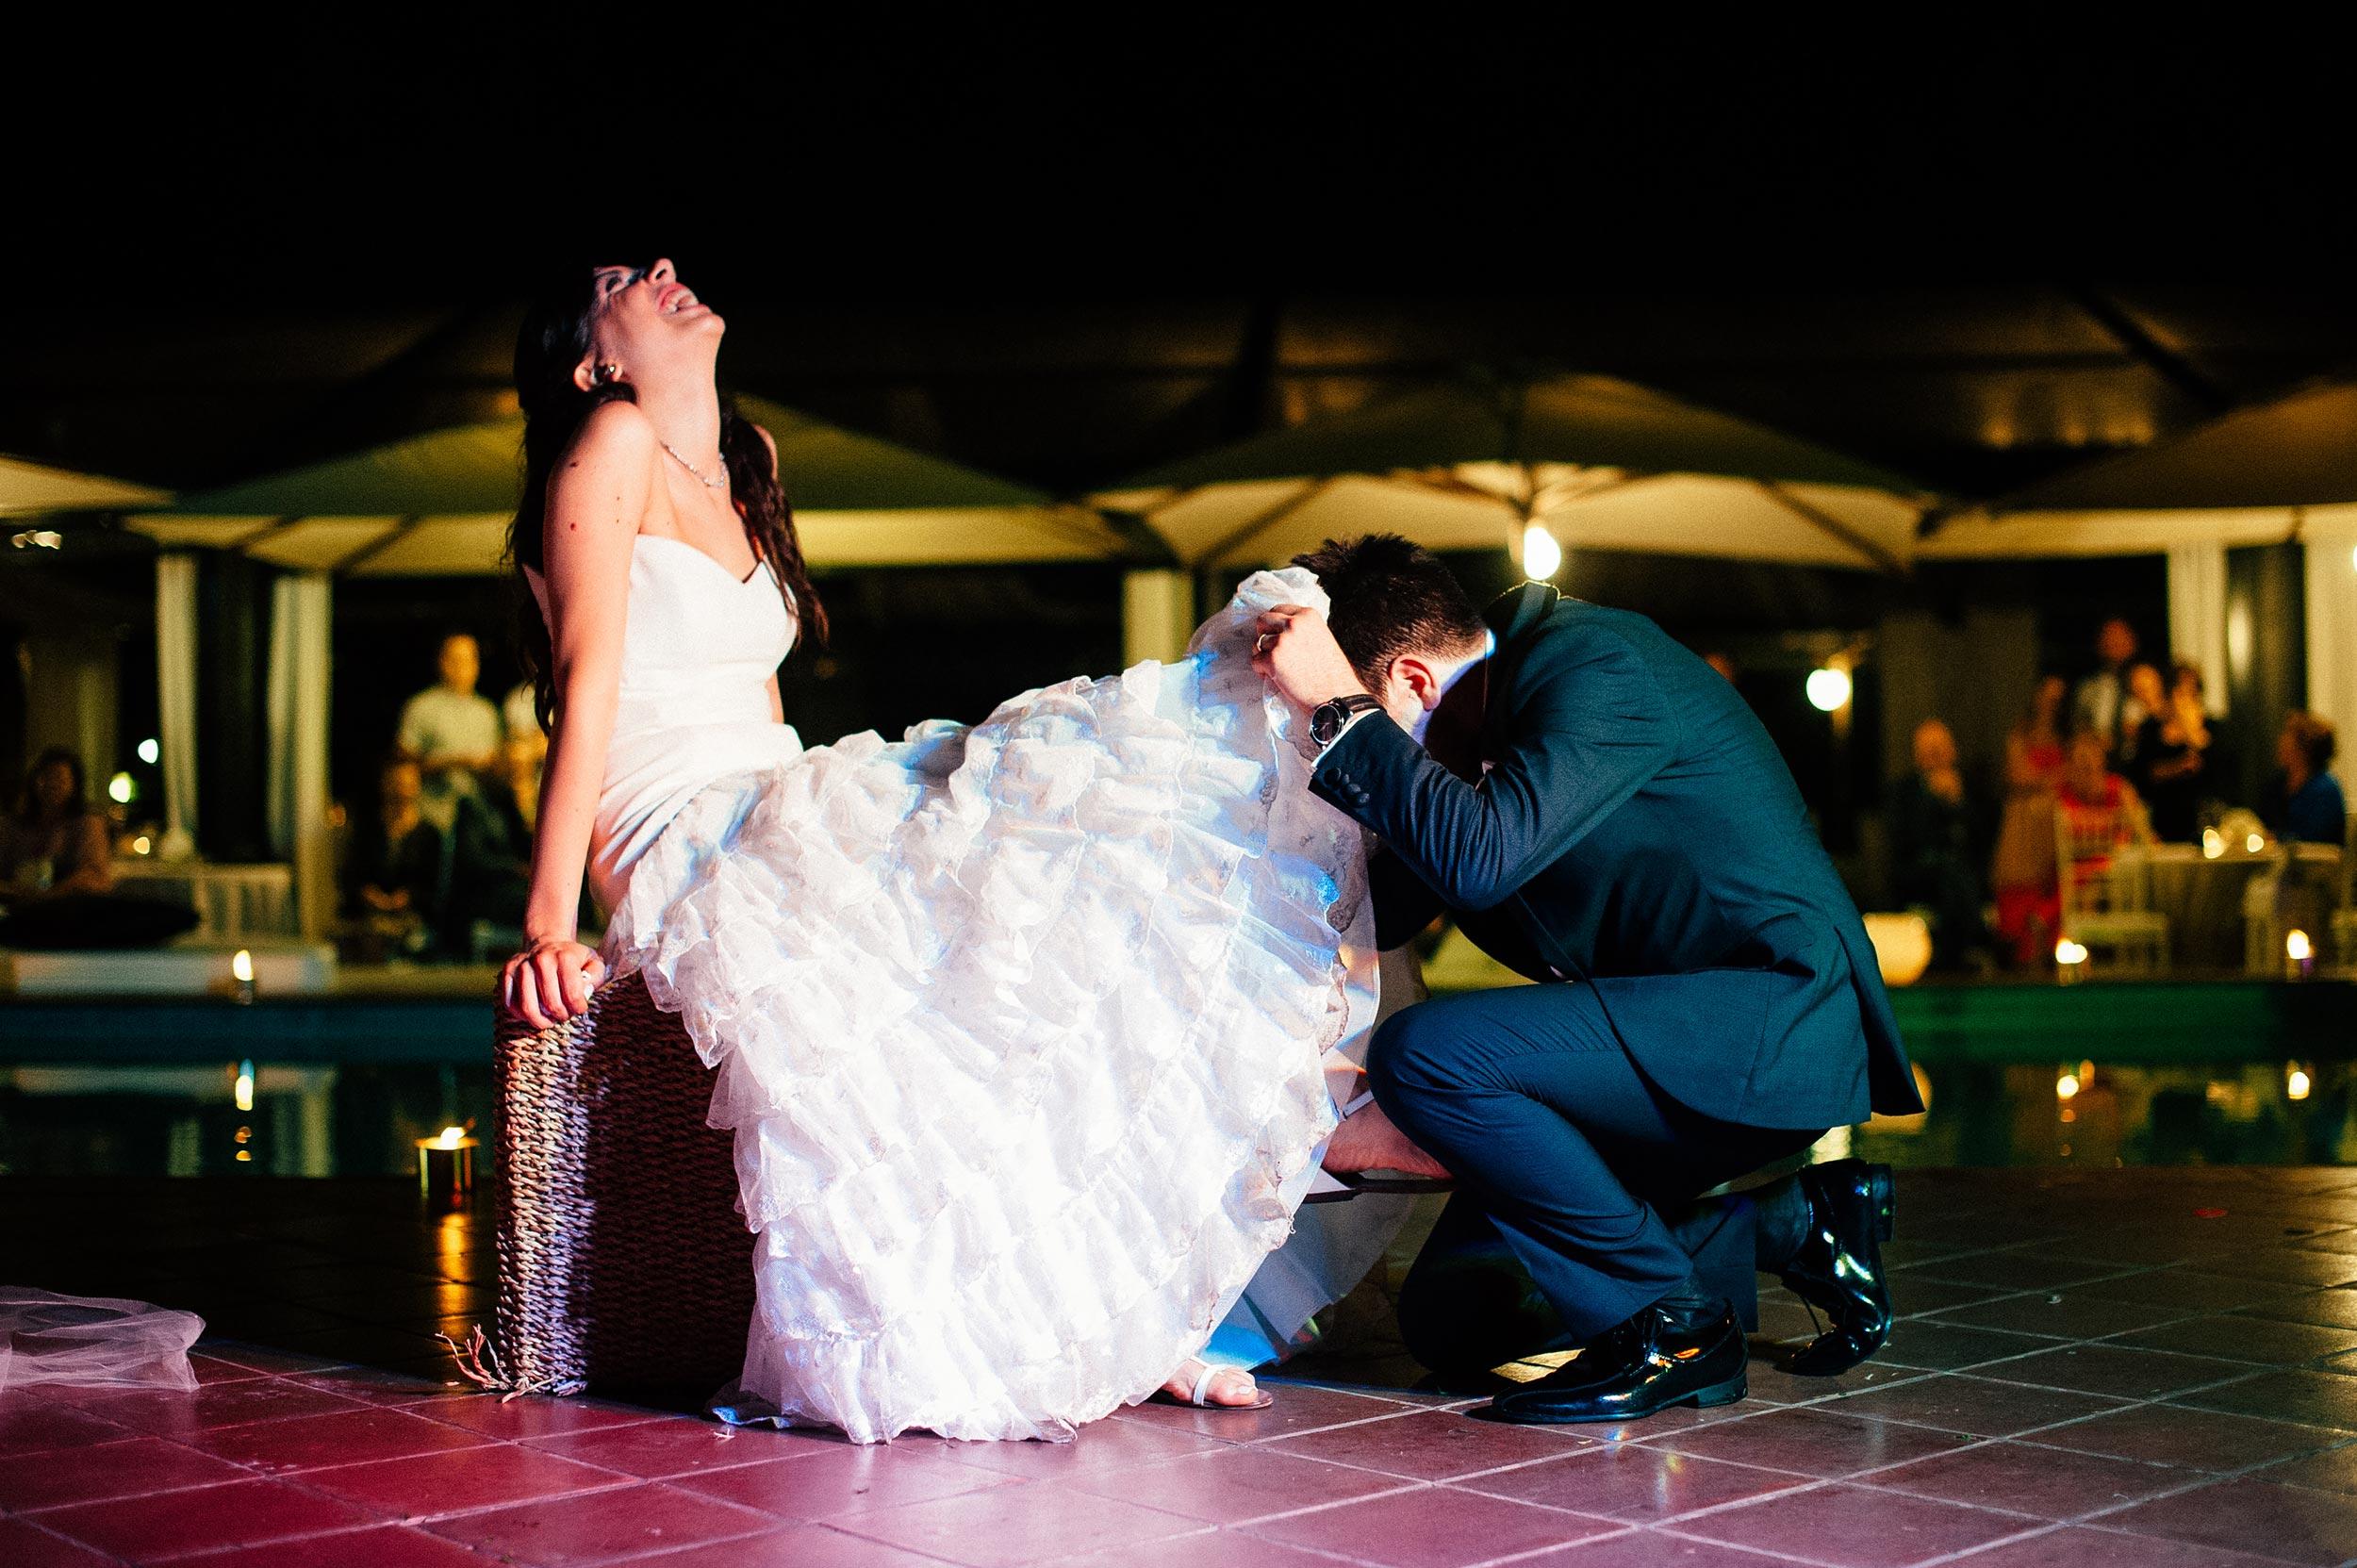 groom-looking-under-brides-wedding-dress-aiming-for-the-garter.jpg